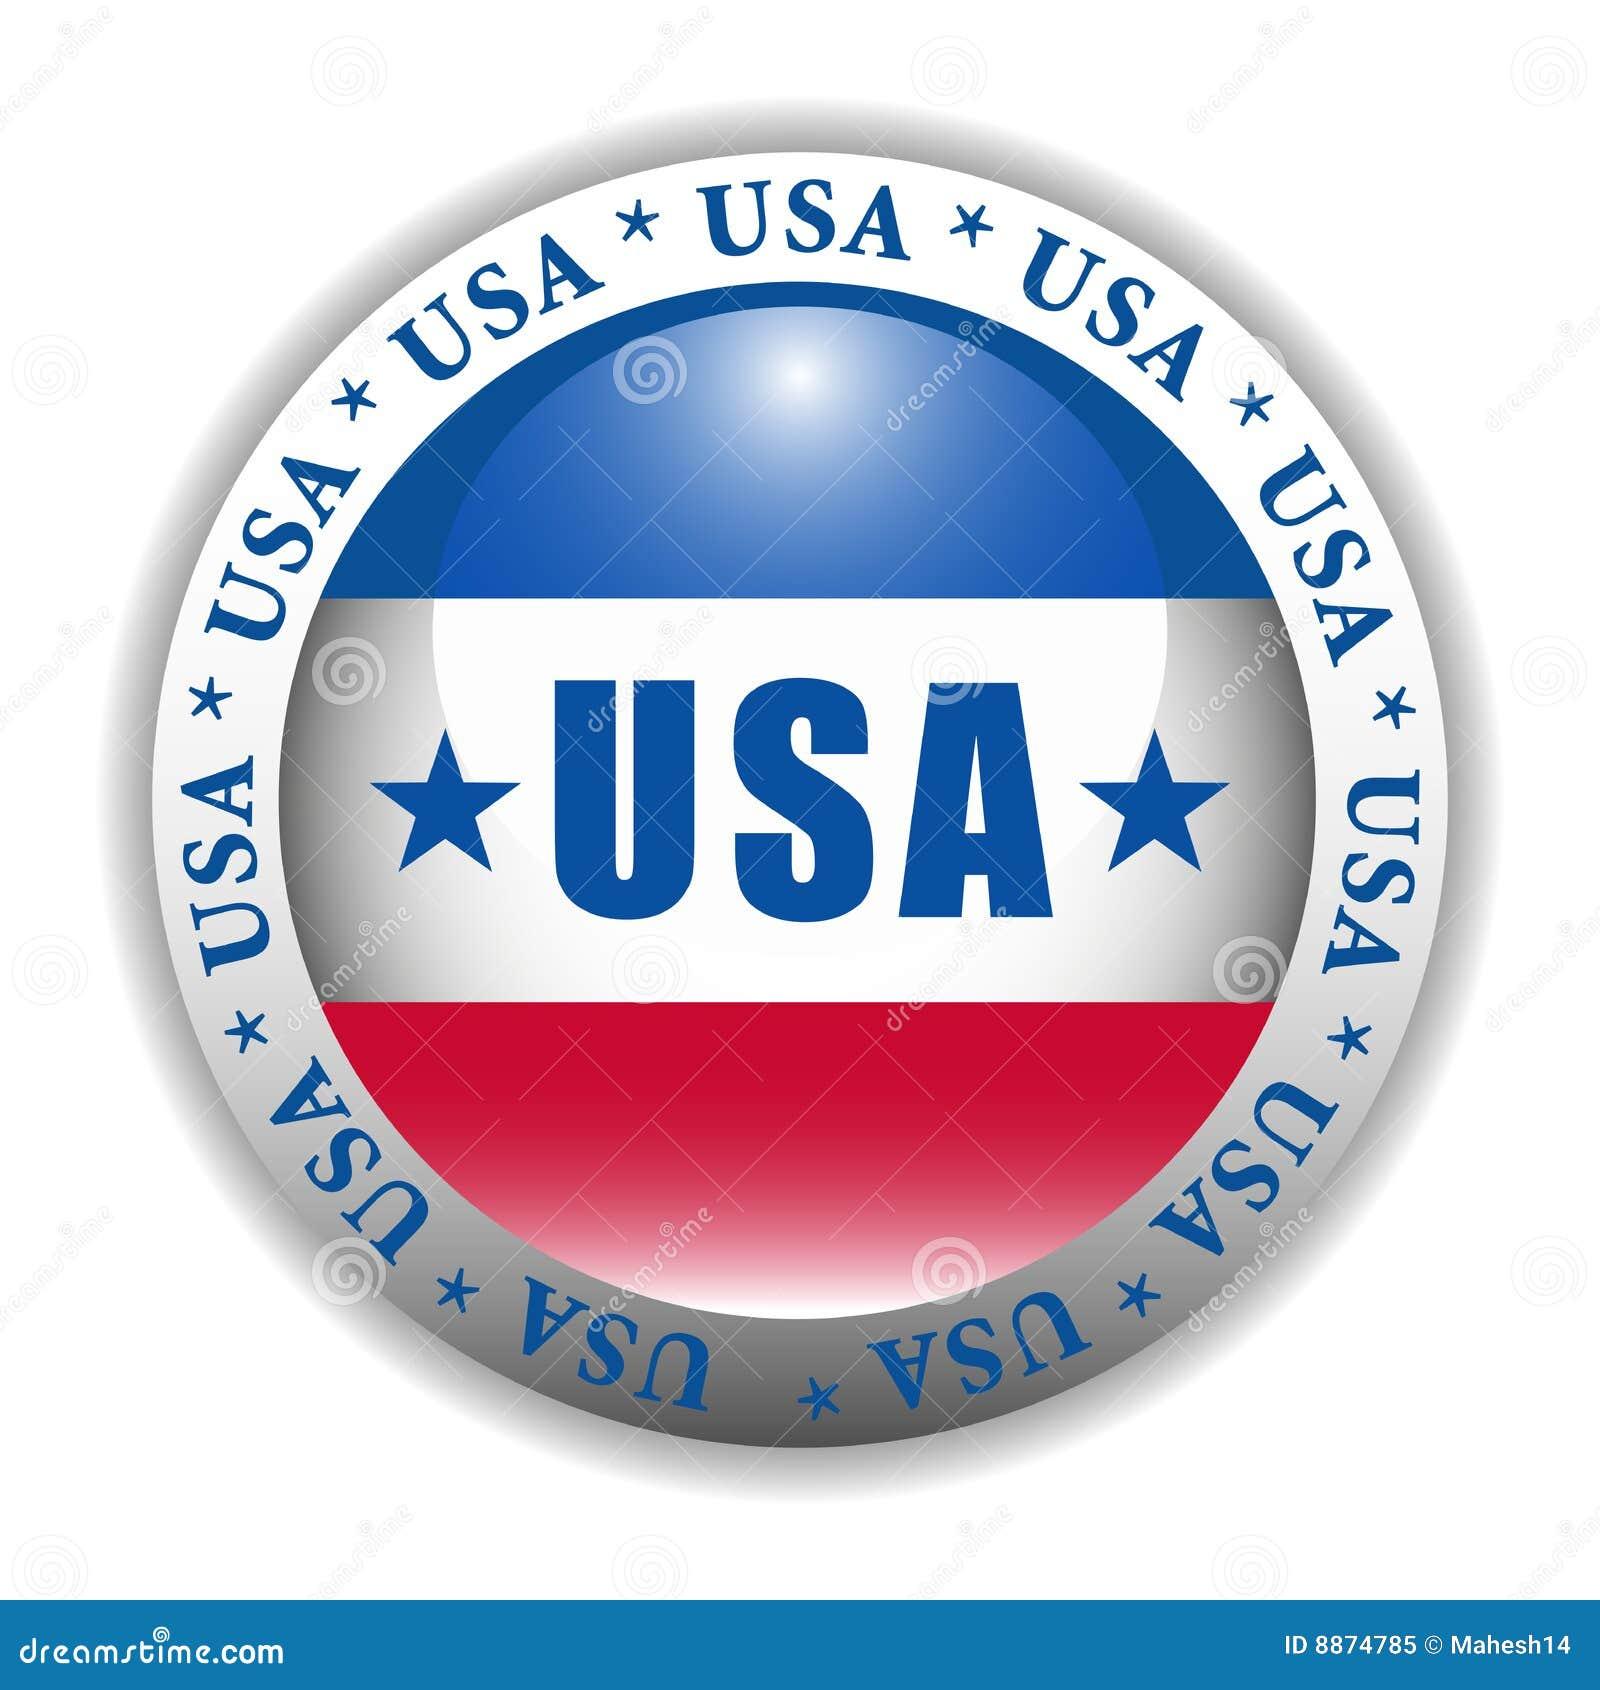 Patriotic USA Button